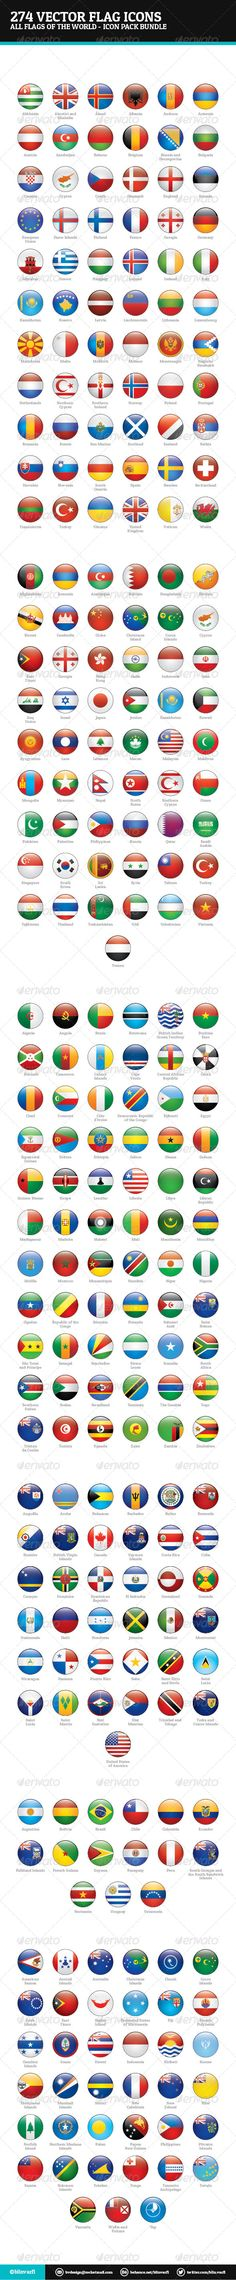 World Flags Vector - Icon Bundle #GraphicRiver World Flags Vector – Web Icons Bundle World Flags Vector Icon Bundle are a pack of 274 national flags icons. Icon pack includes these nations: Abkhazia, Akrotiri and Dhekelia, Aland, Albania, Andorra, Armenia, Austria, Azerbaijan, Belarus, Belgium, Bosnia and Herzegovina, Bulgaria, Croatia, Cyprus, Czech, Denmark, Estonia, Europe, Faroe Islands, Finland, France, Georgia, Germany, Giblartar, Greece, Hungary, Iceland, Ireland, Italy, Kazakhstan…